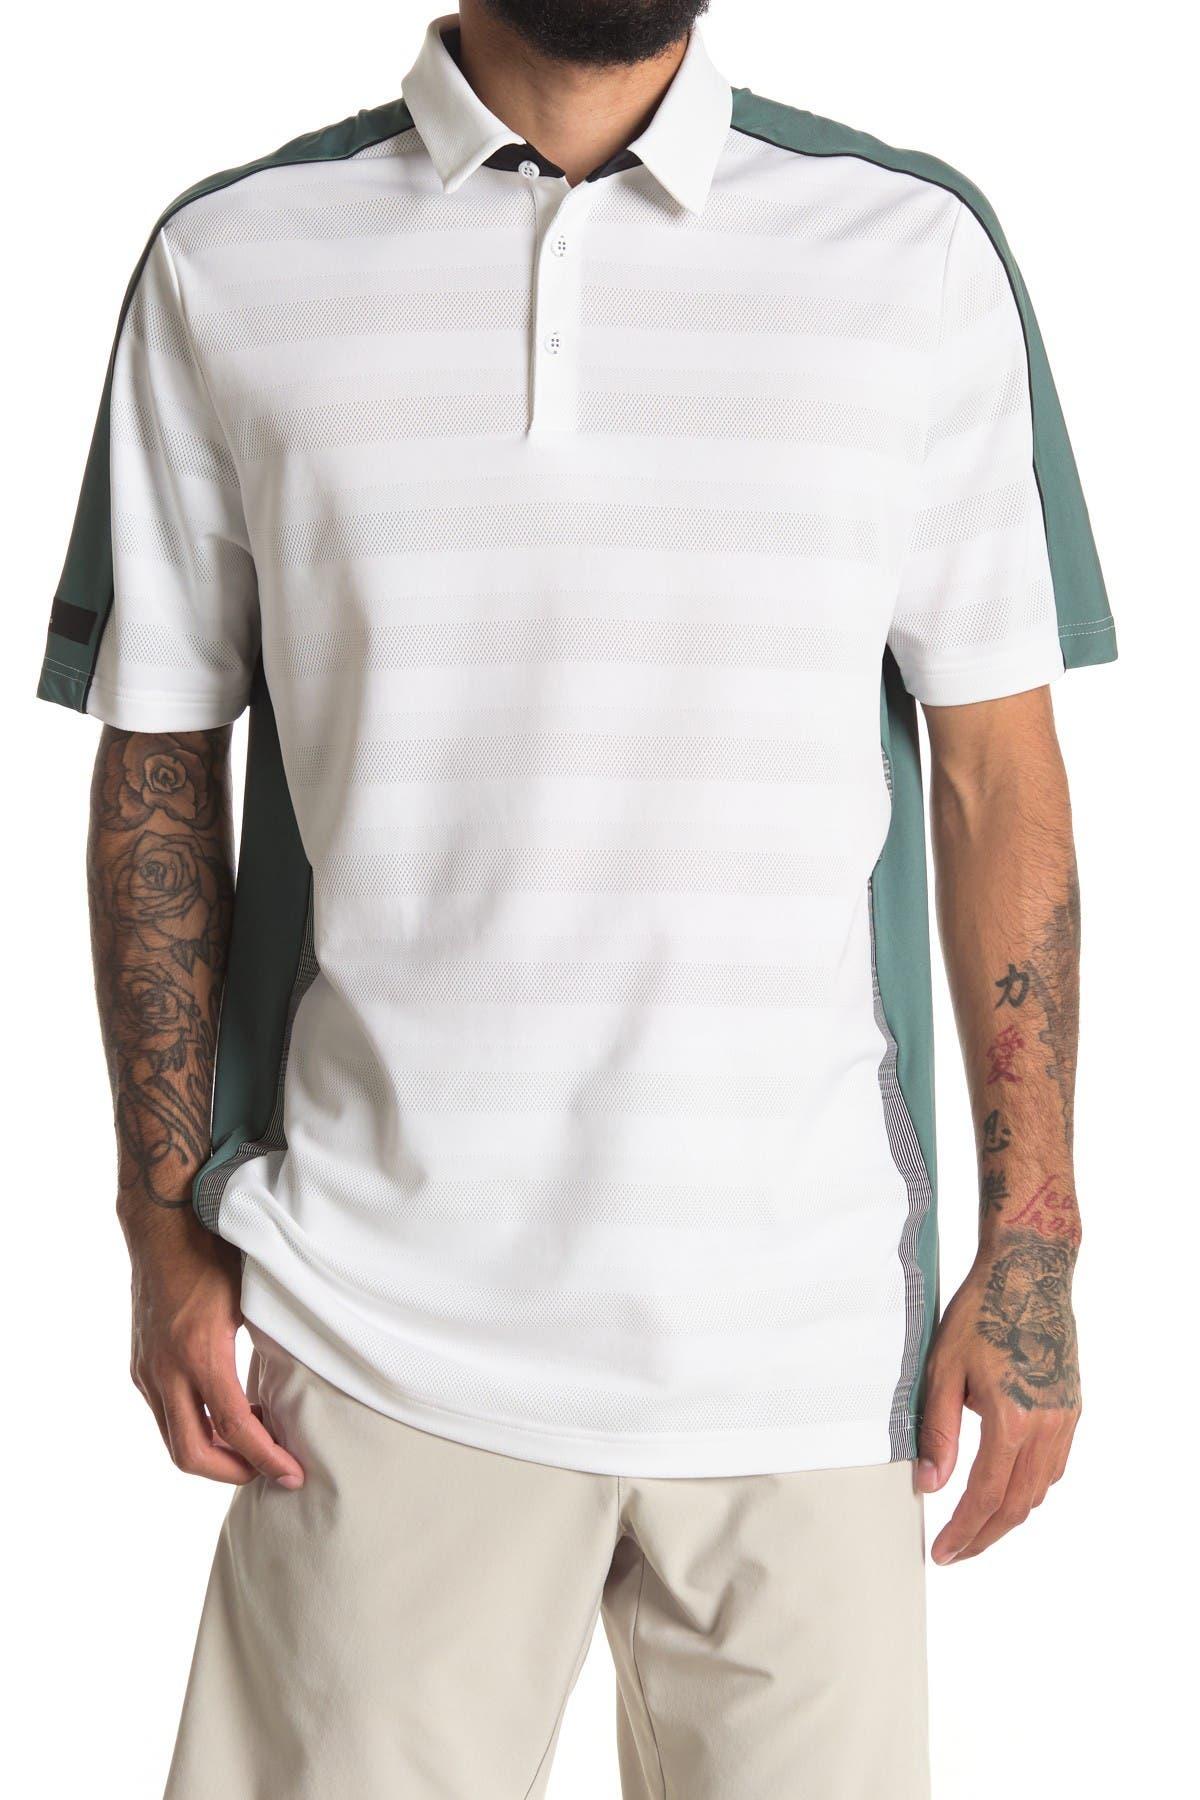 Image of Adidas Golf Sport Style Polo Shirt